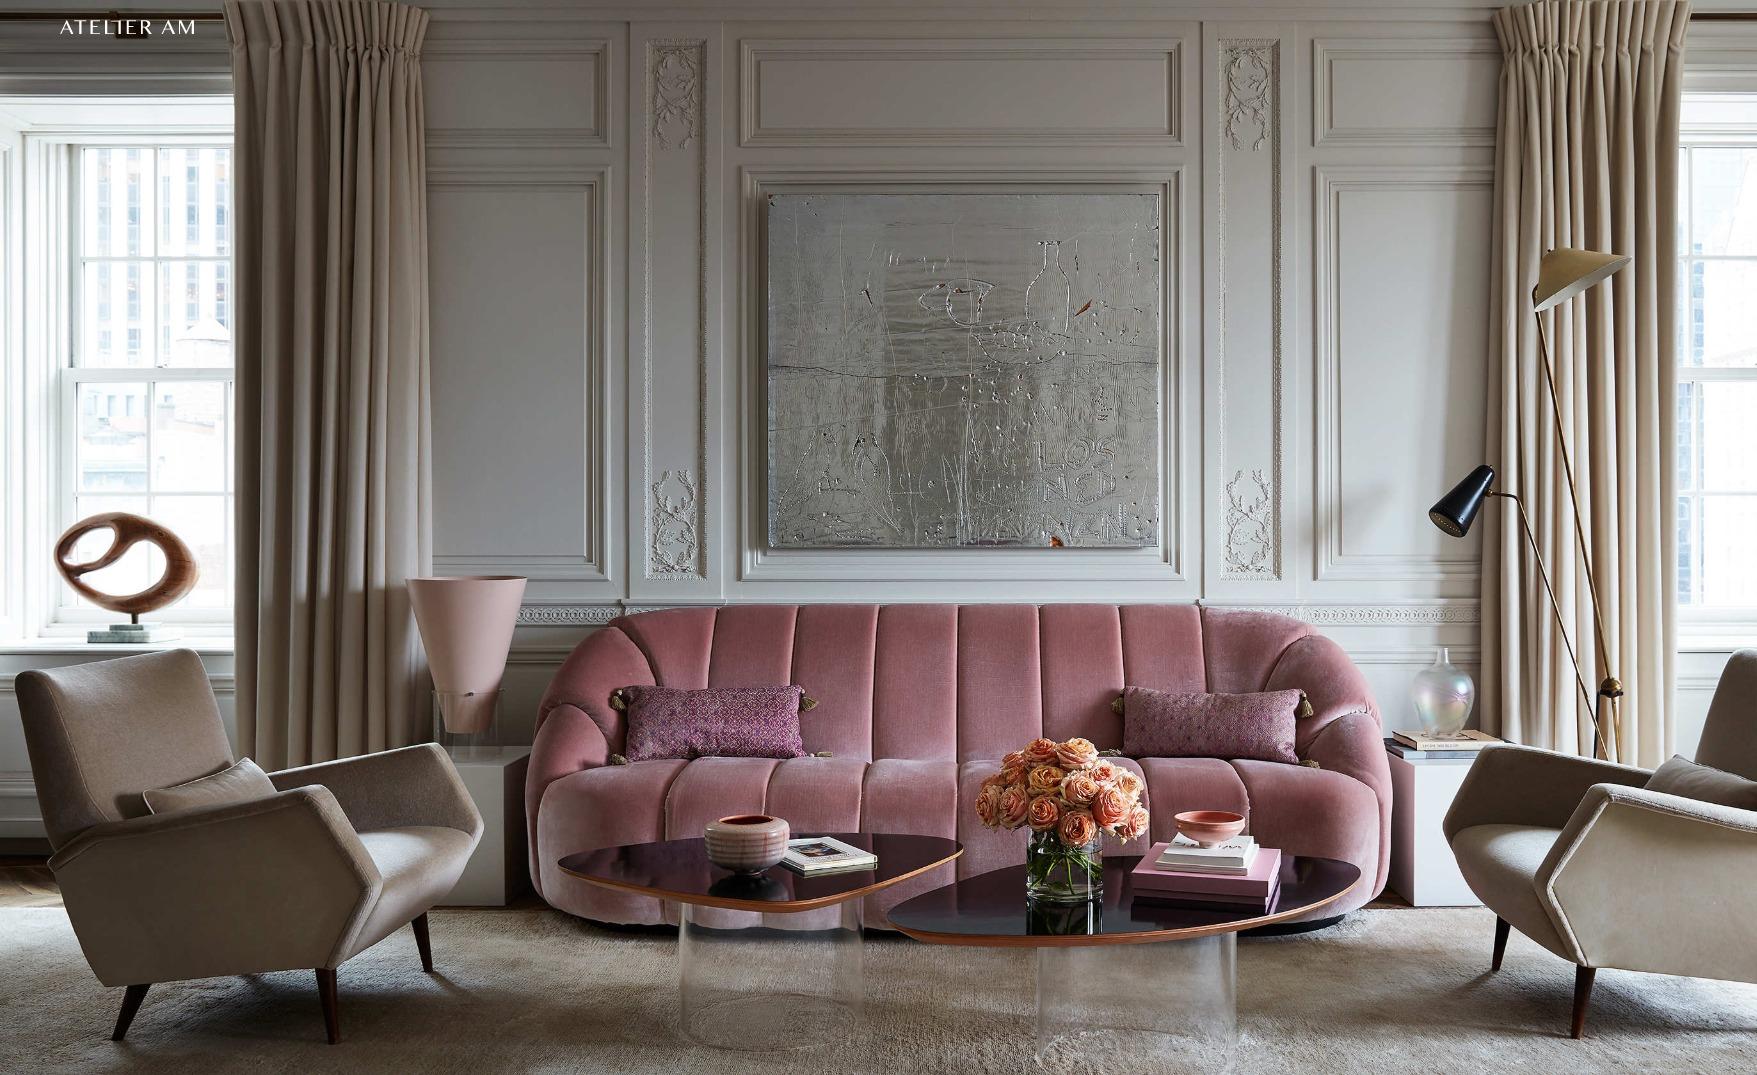 Interior by atelierAM